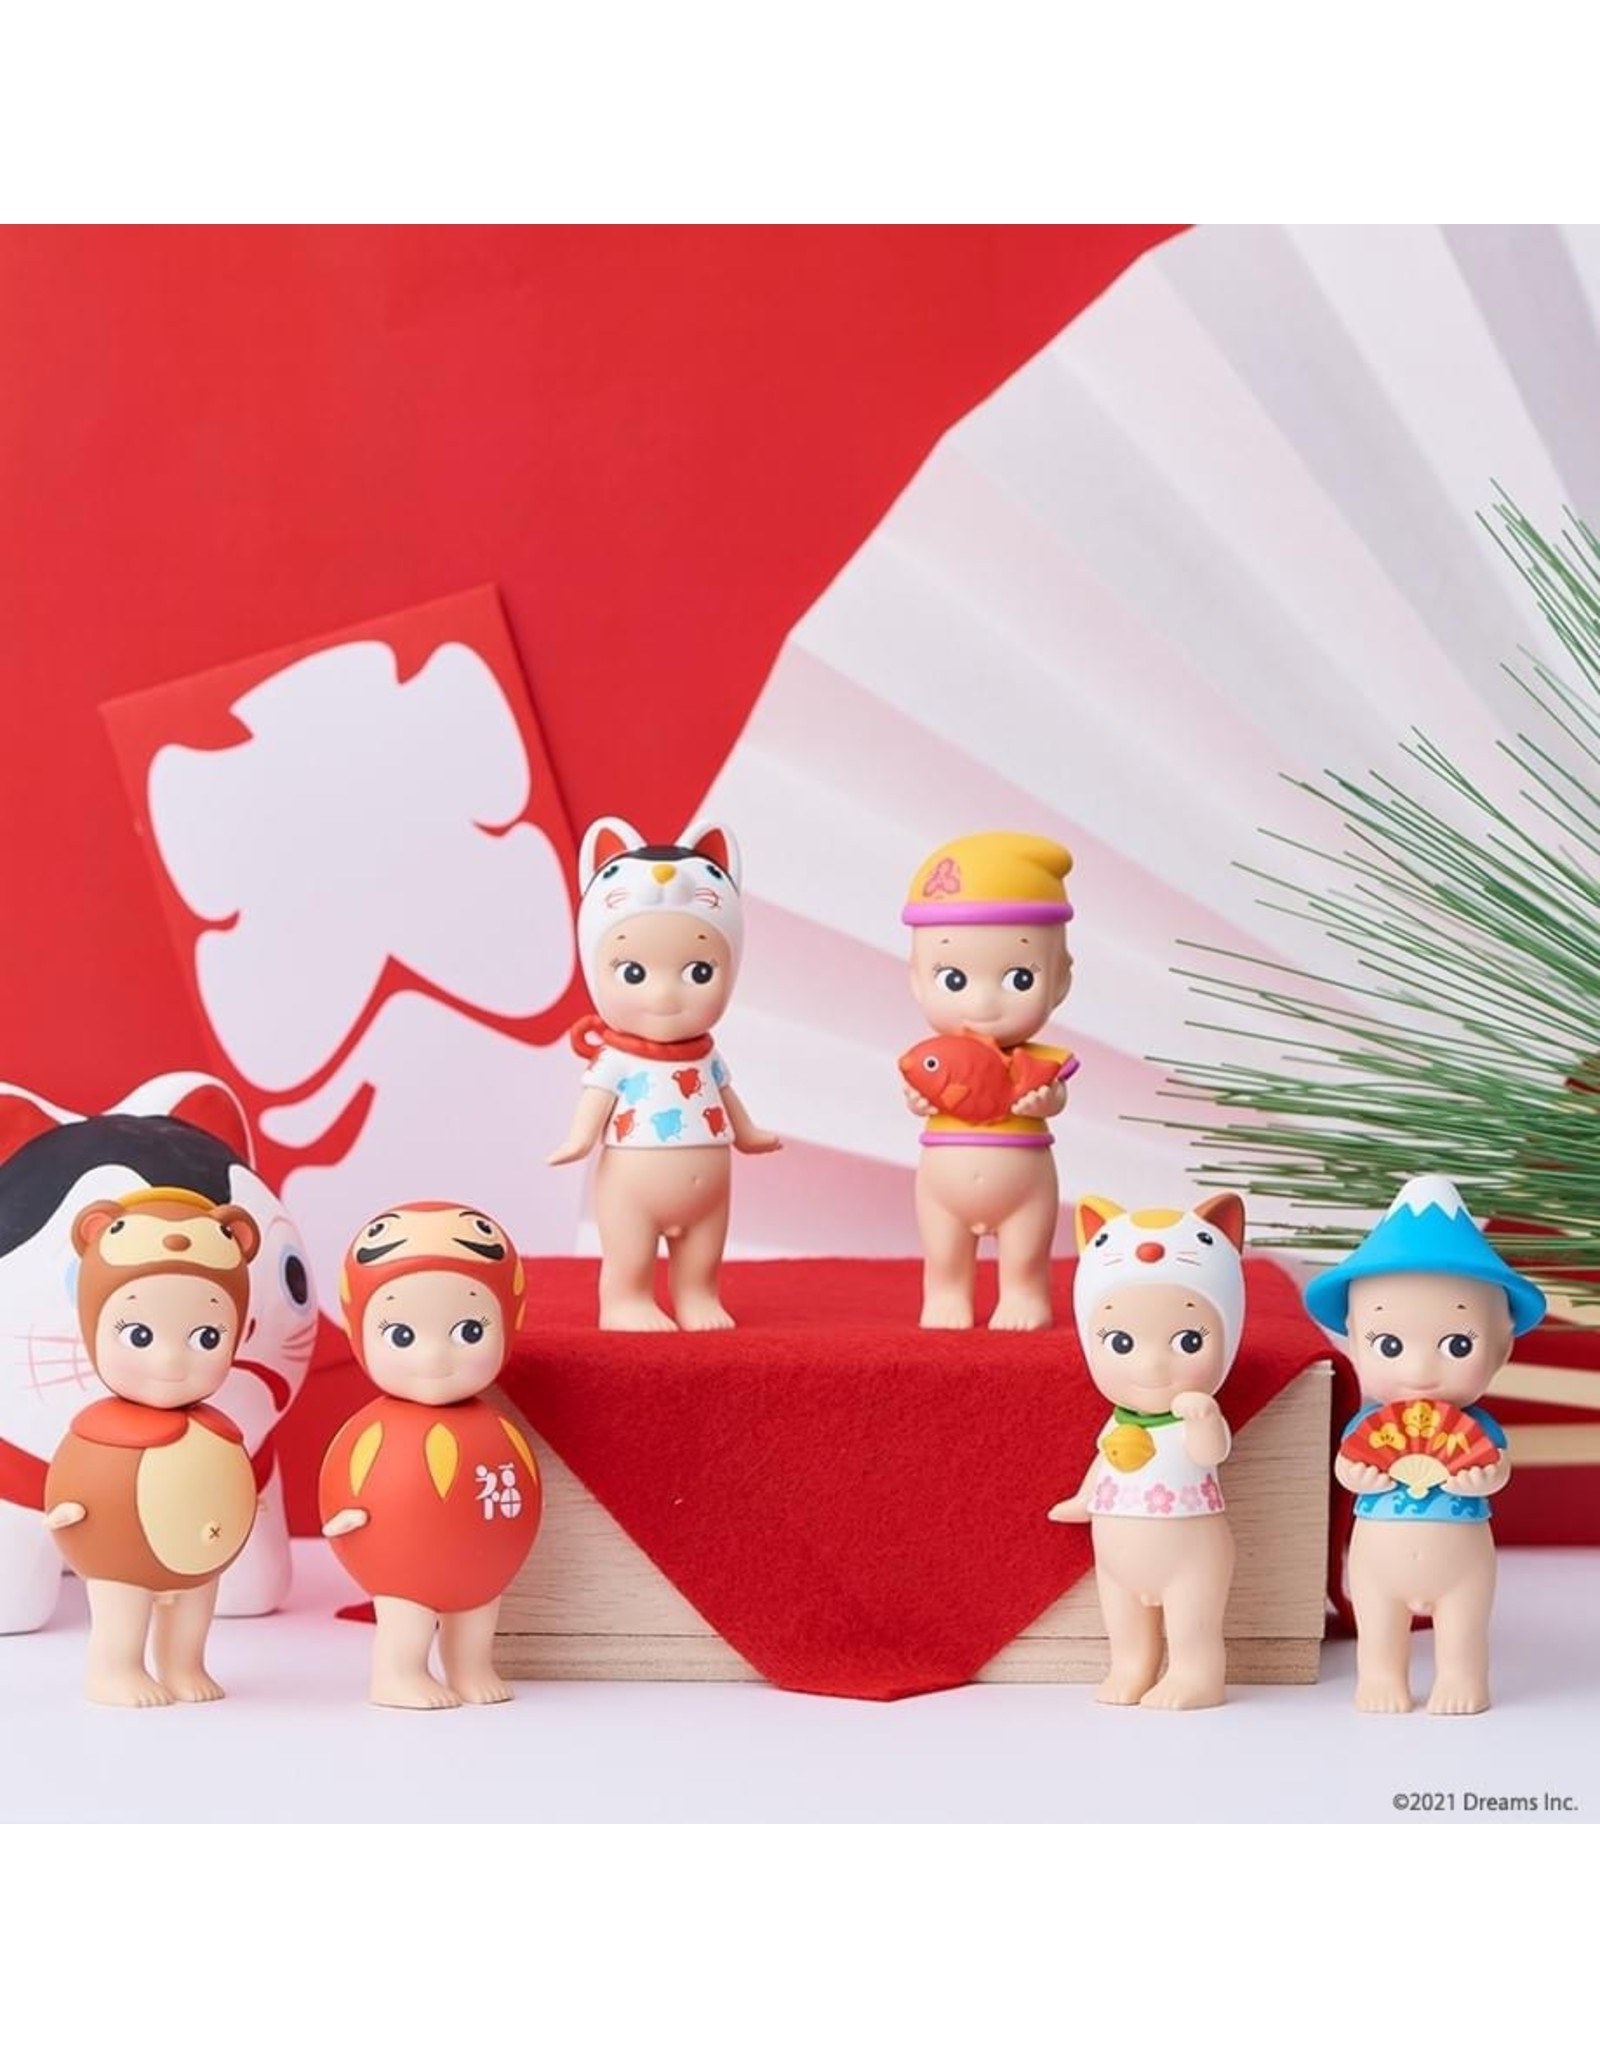 Sonny Angel Japanese Good Luck Series - Box van 12